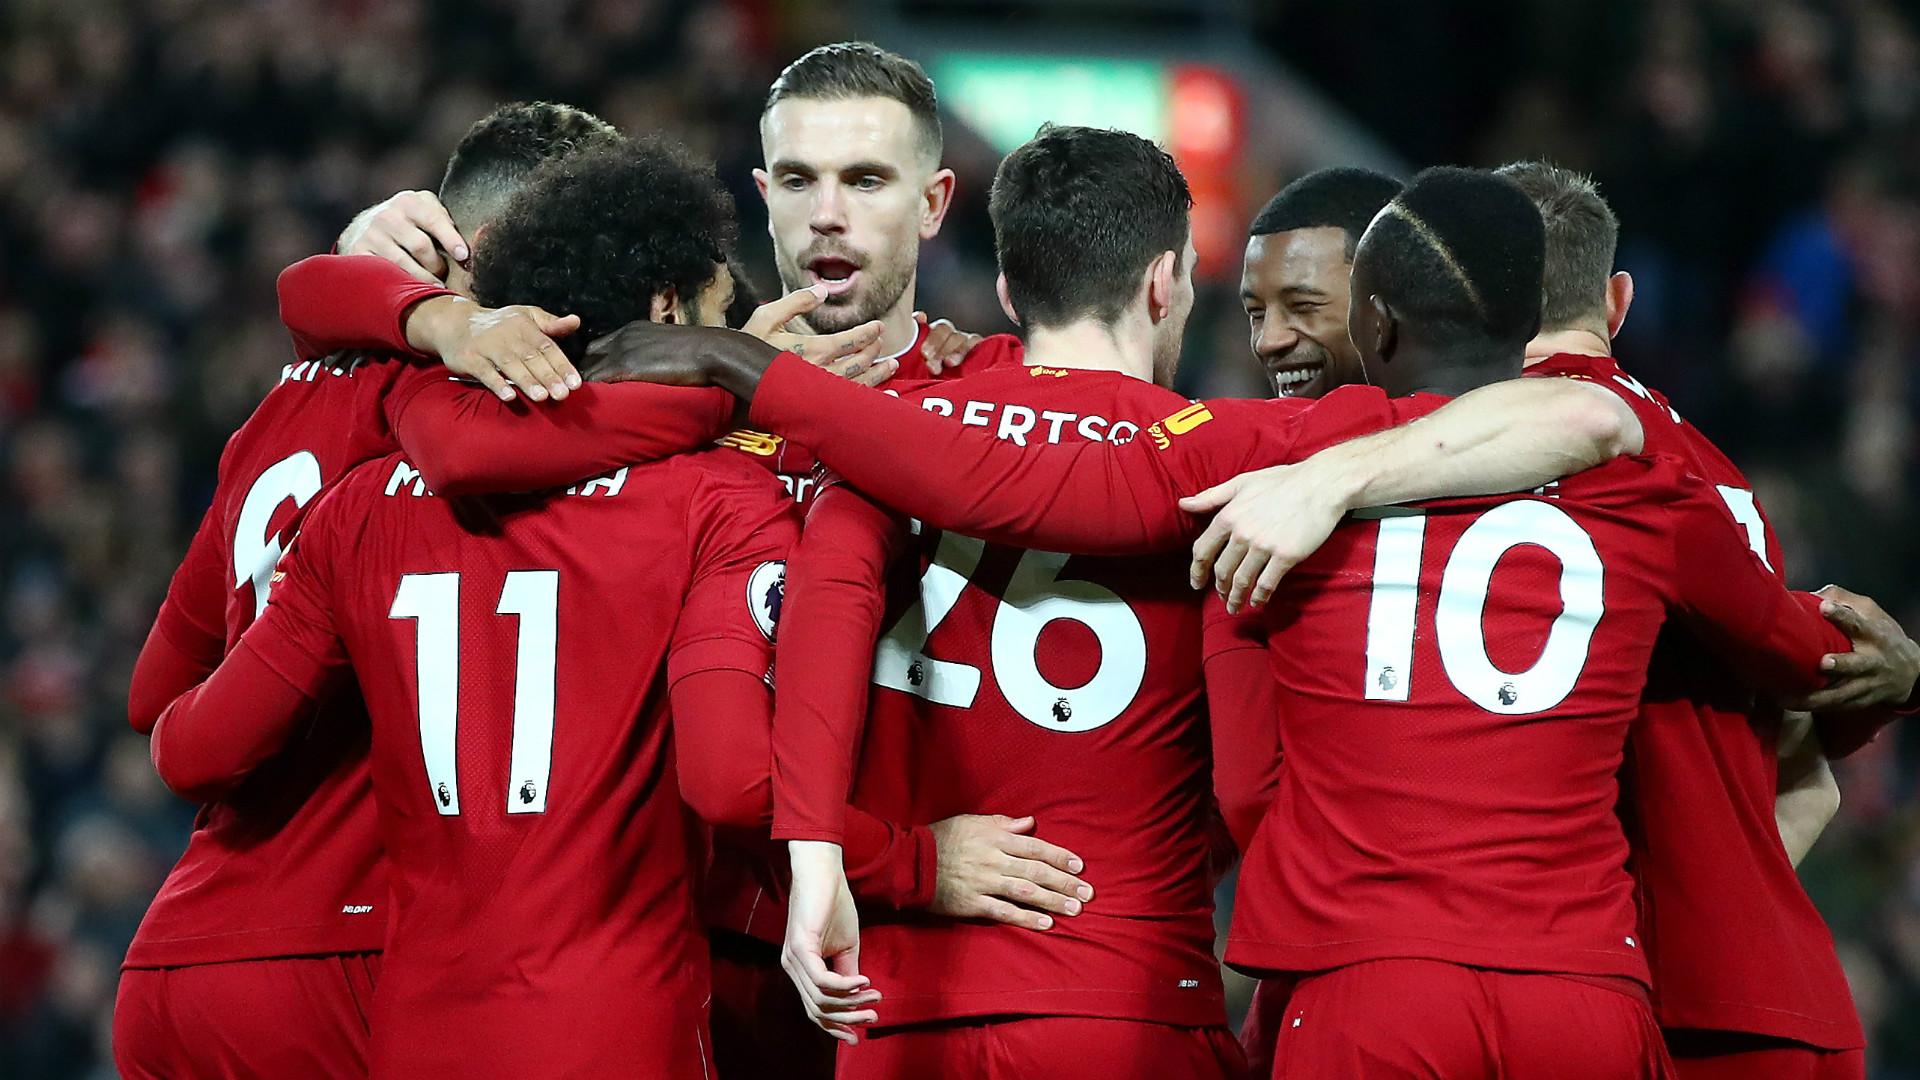 FA Cup: Solskjaer sends Martial, Lingard home from Man Utd training